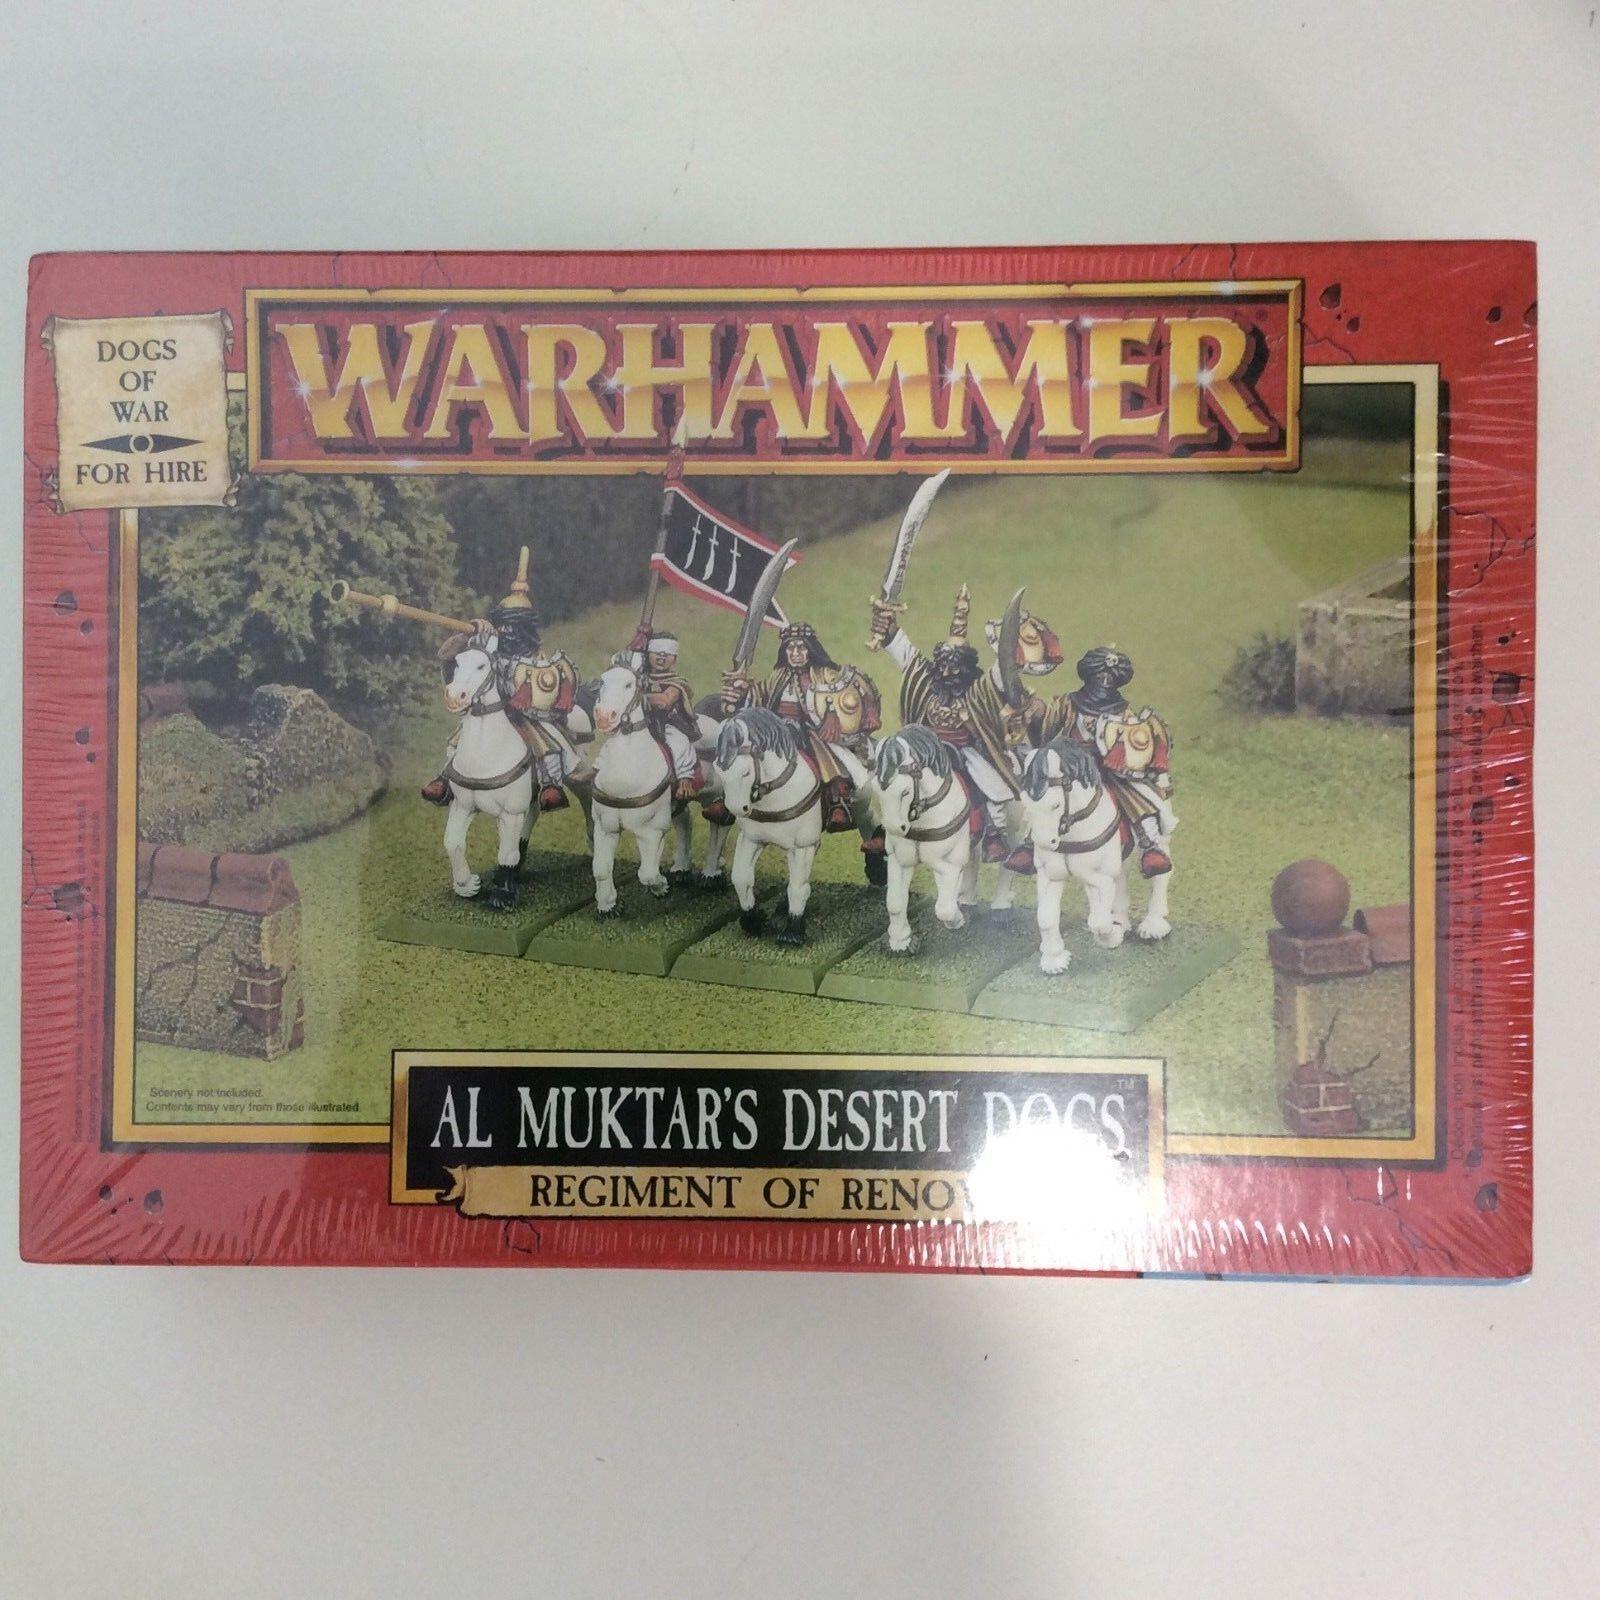 WARHAMMER WARHAMMER FANTASY AL MUKTAR'S DESERT DOGS OF WAR OOP